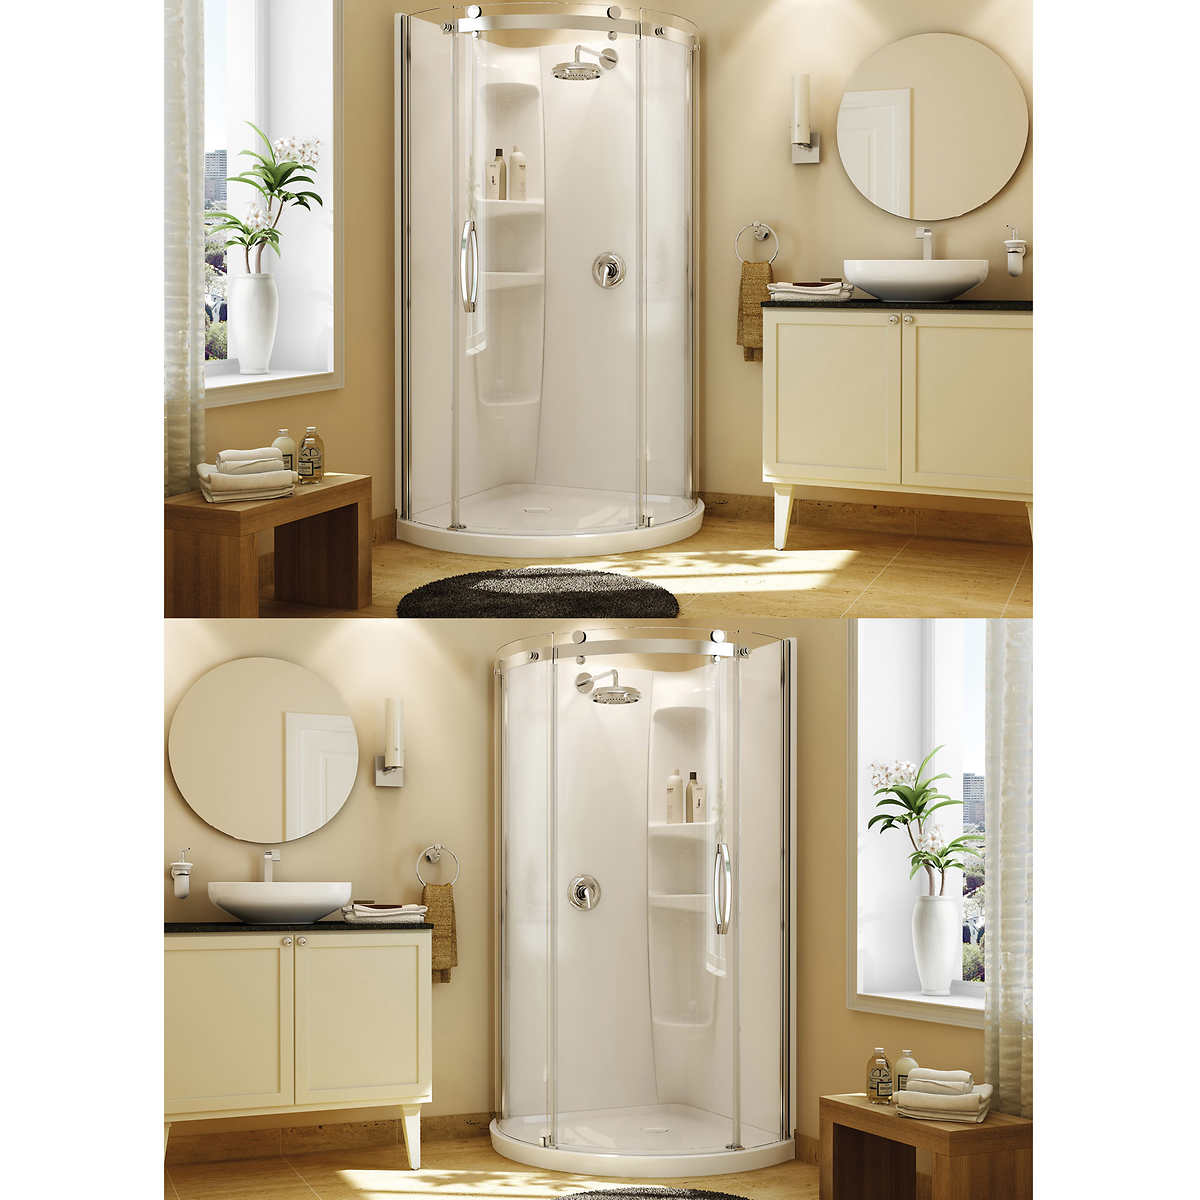 showers costco maax olympia round corner shower kits